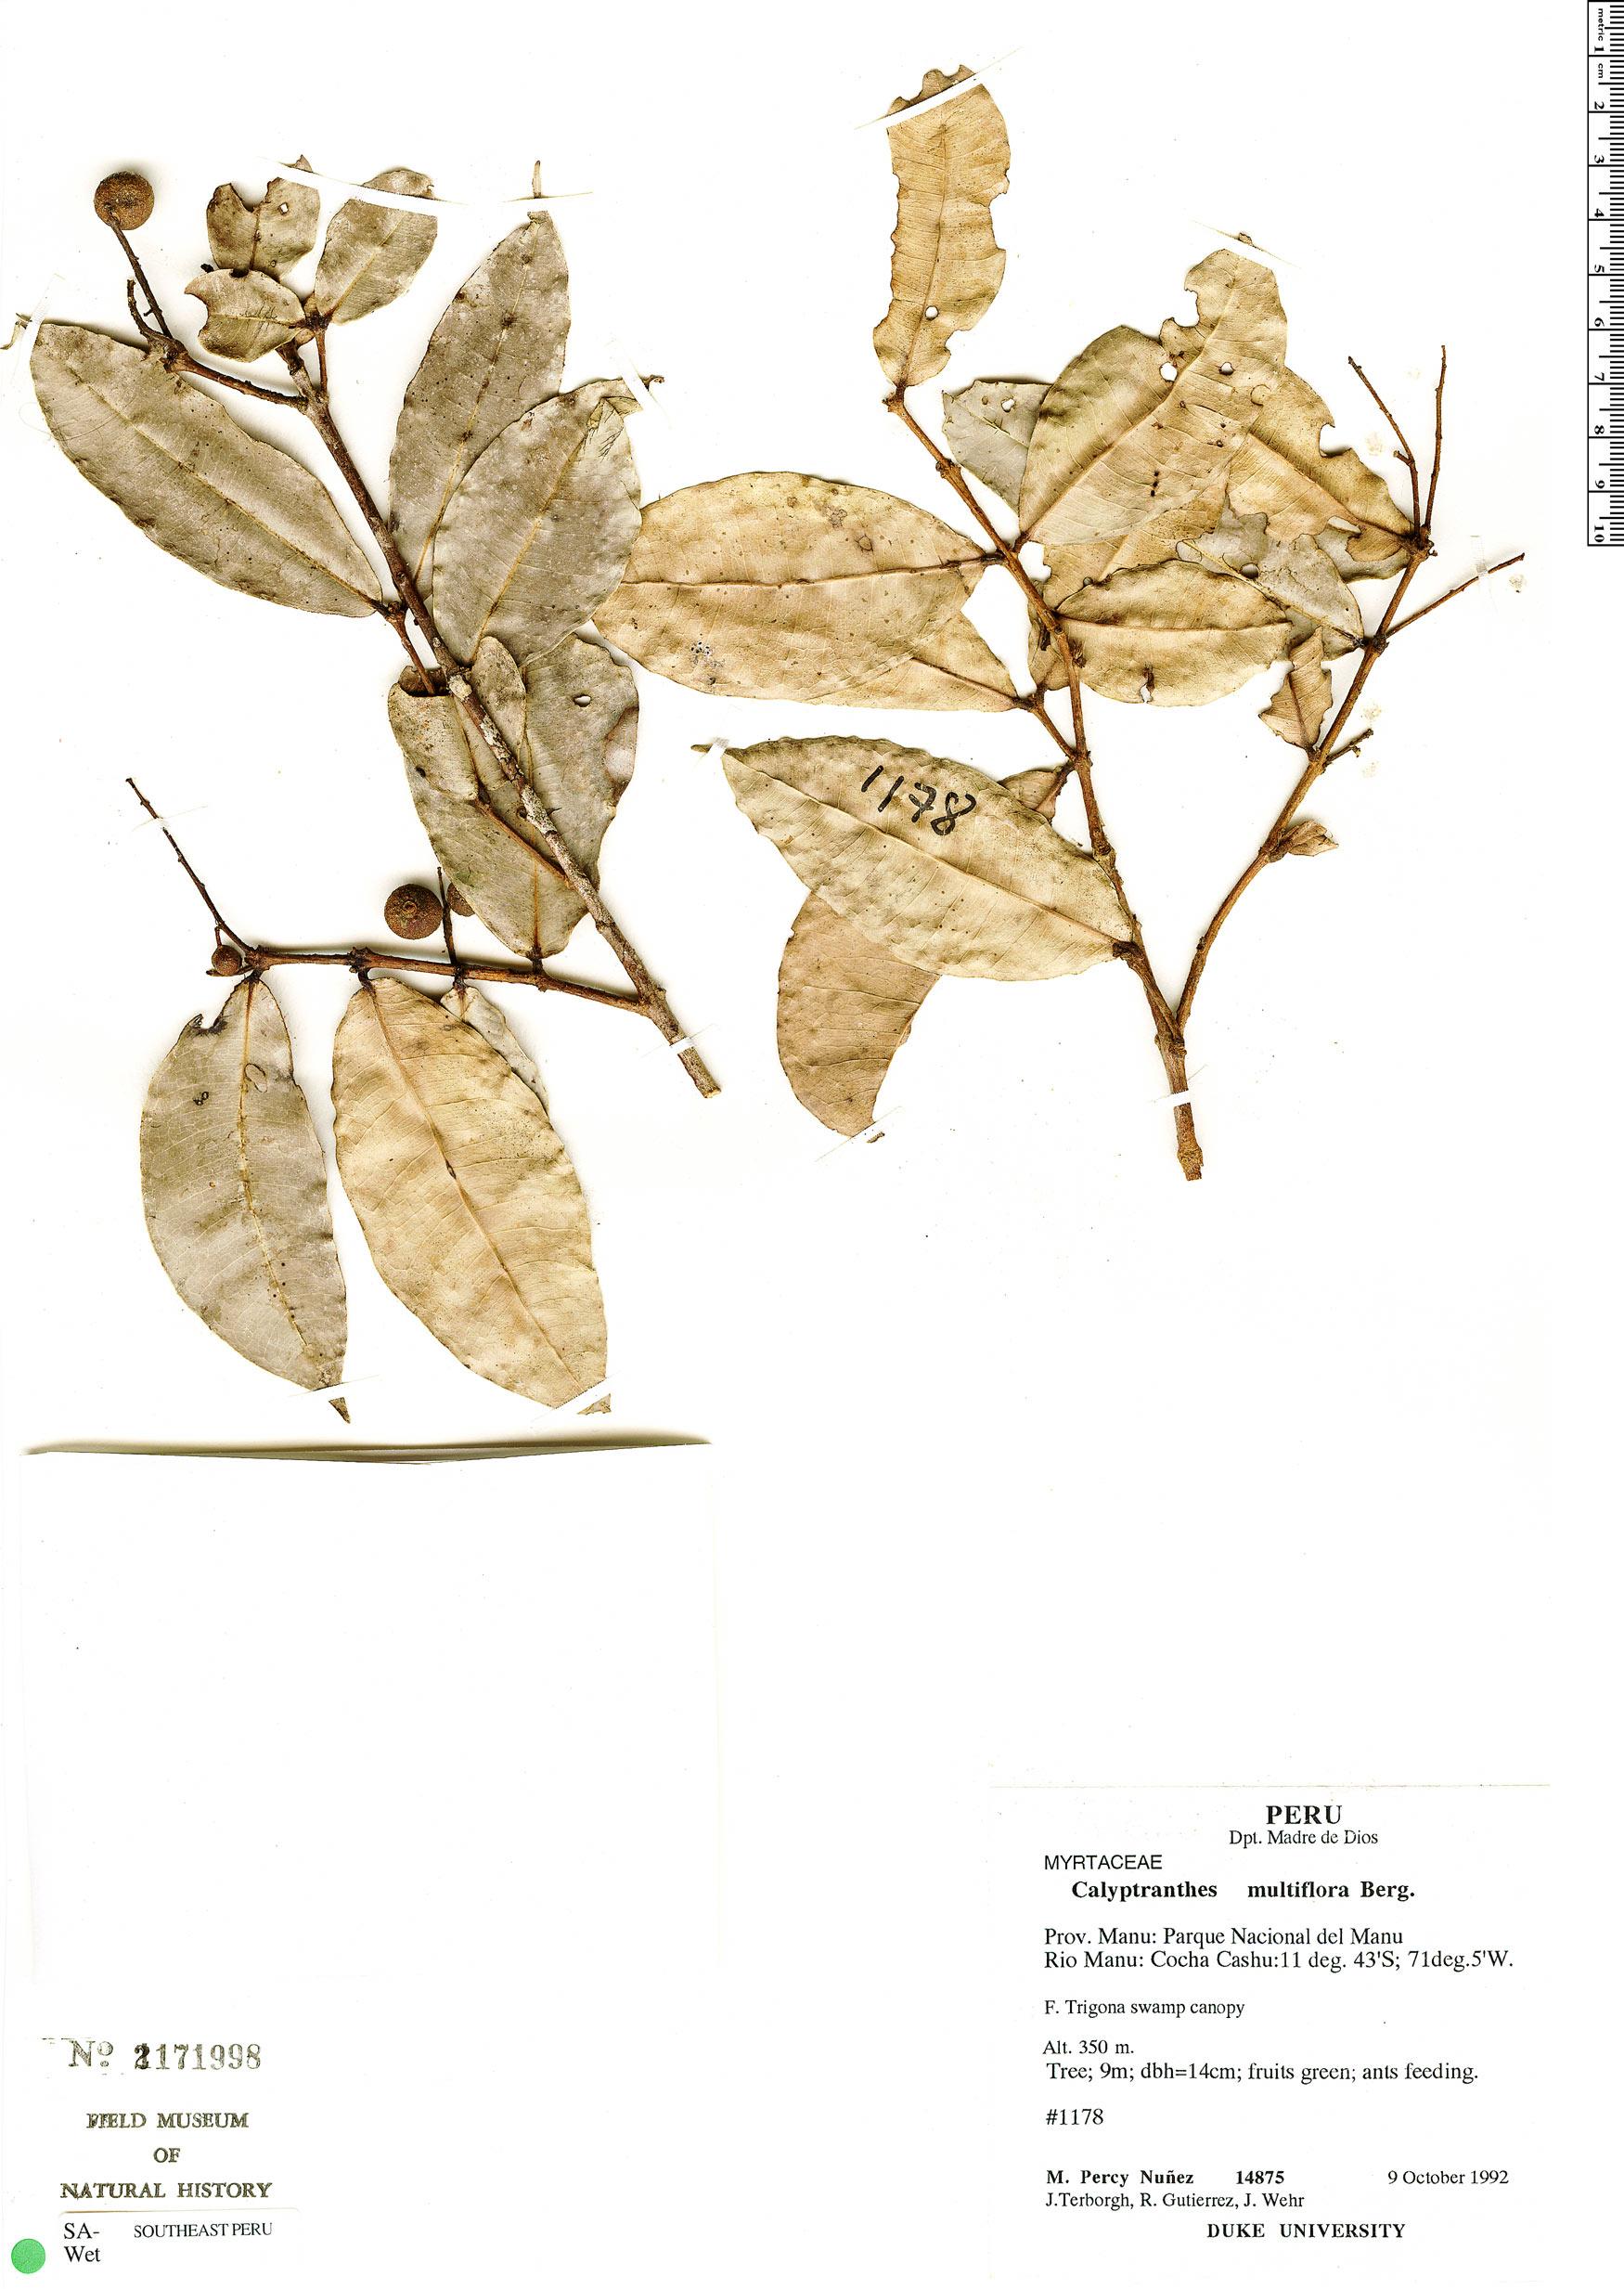 Specimen: Calyptranthes multiflora